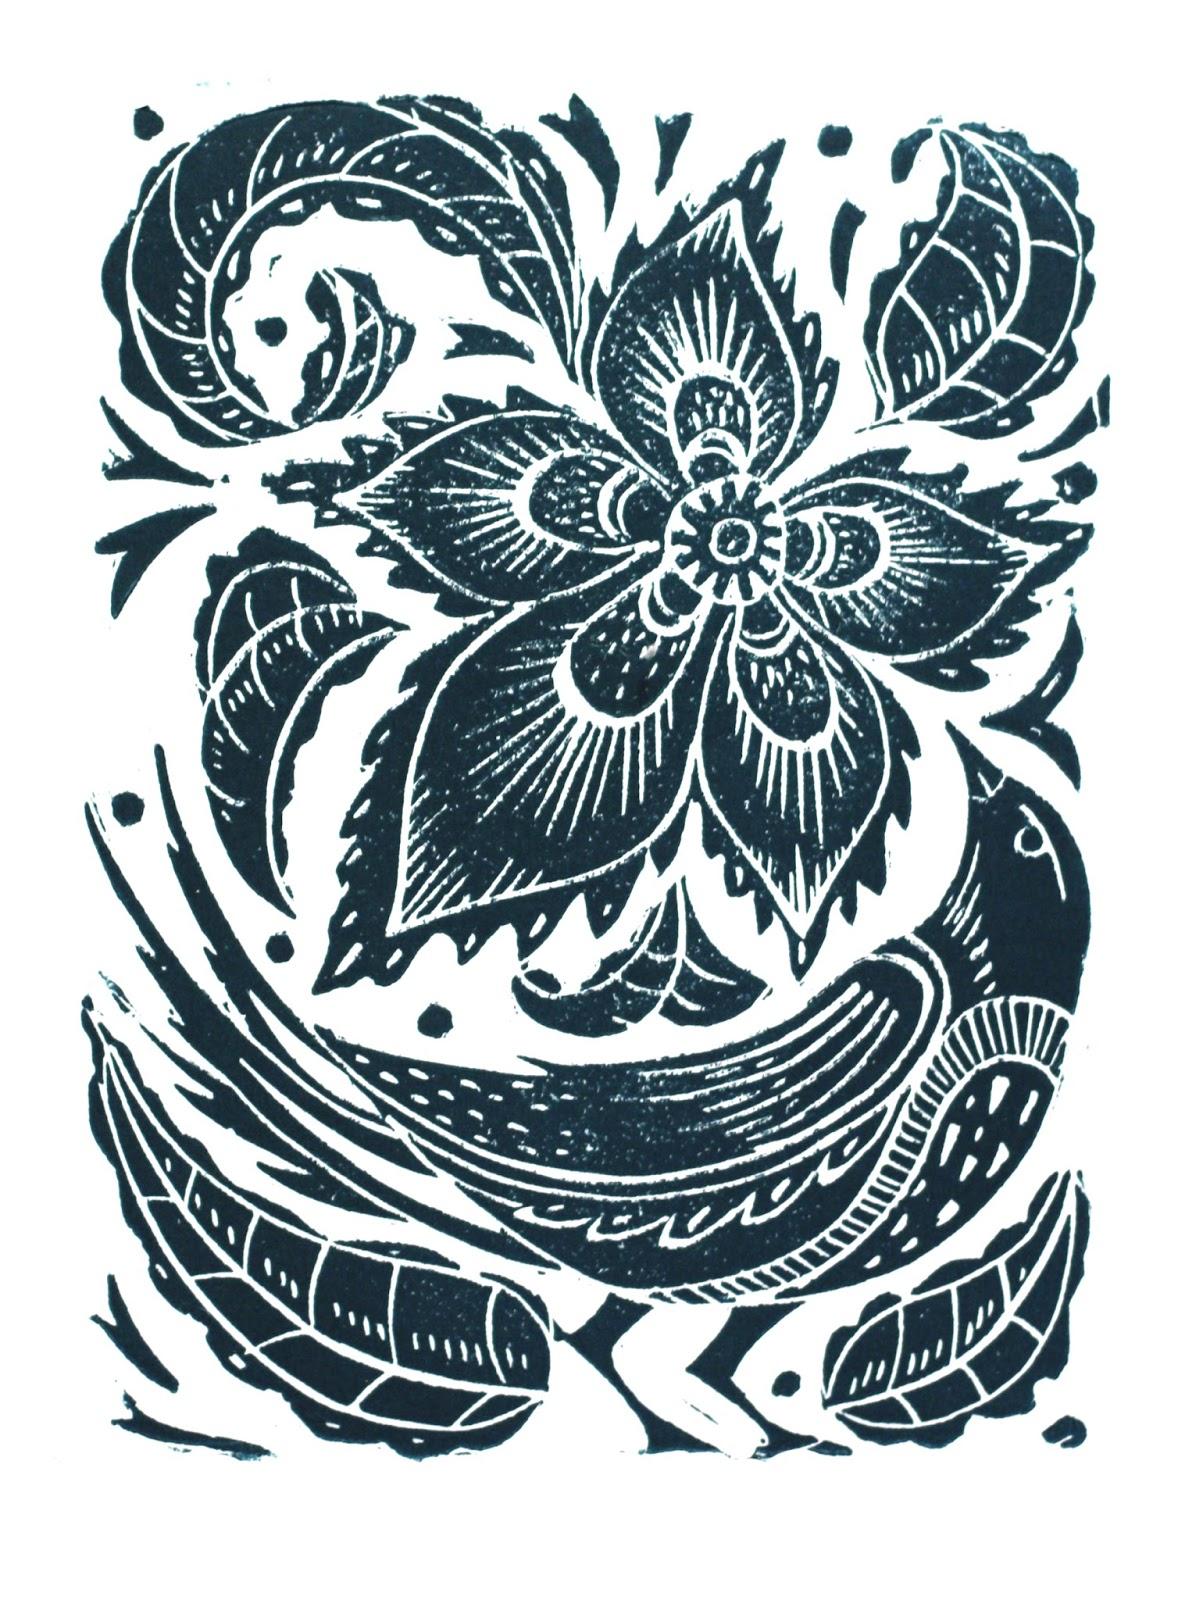 Mangle Prints Fabric Printing